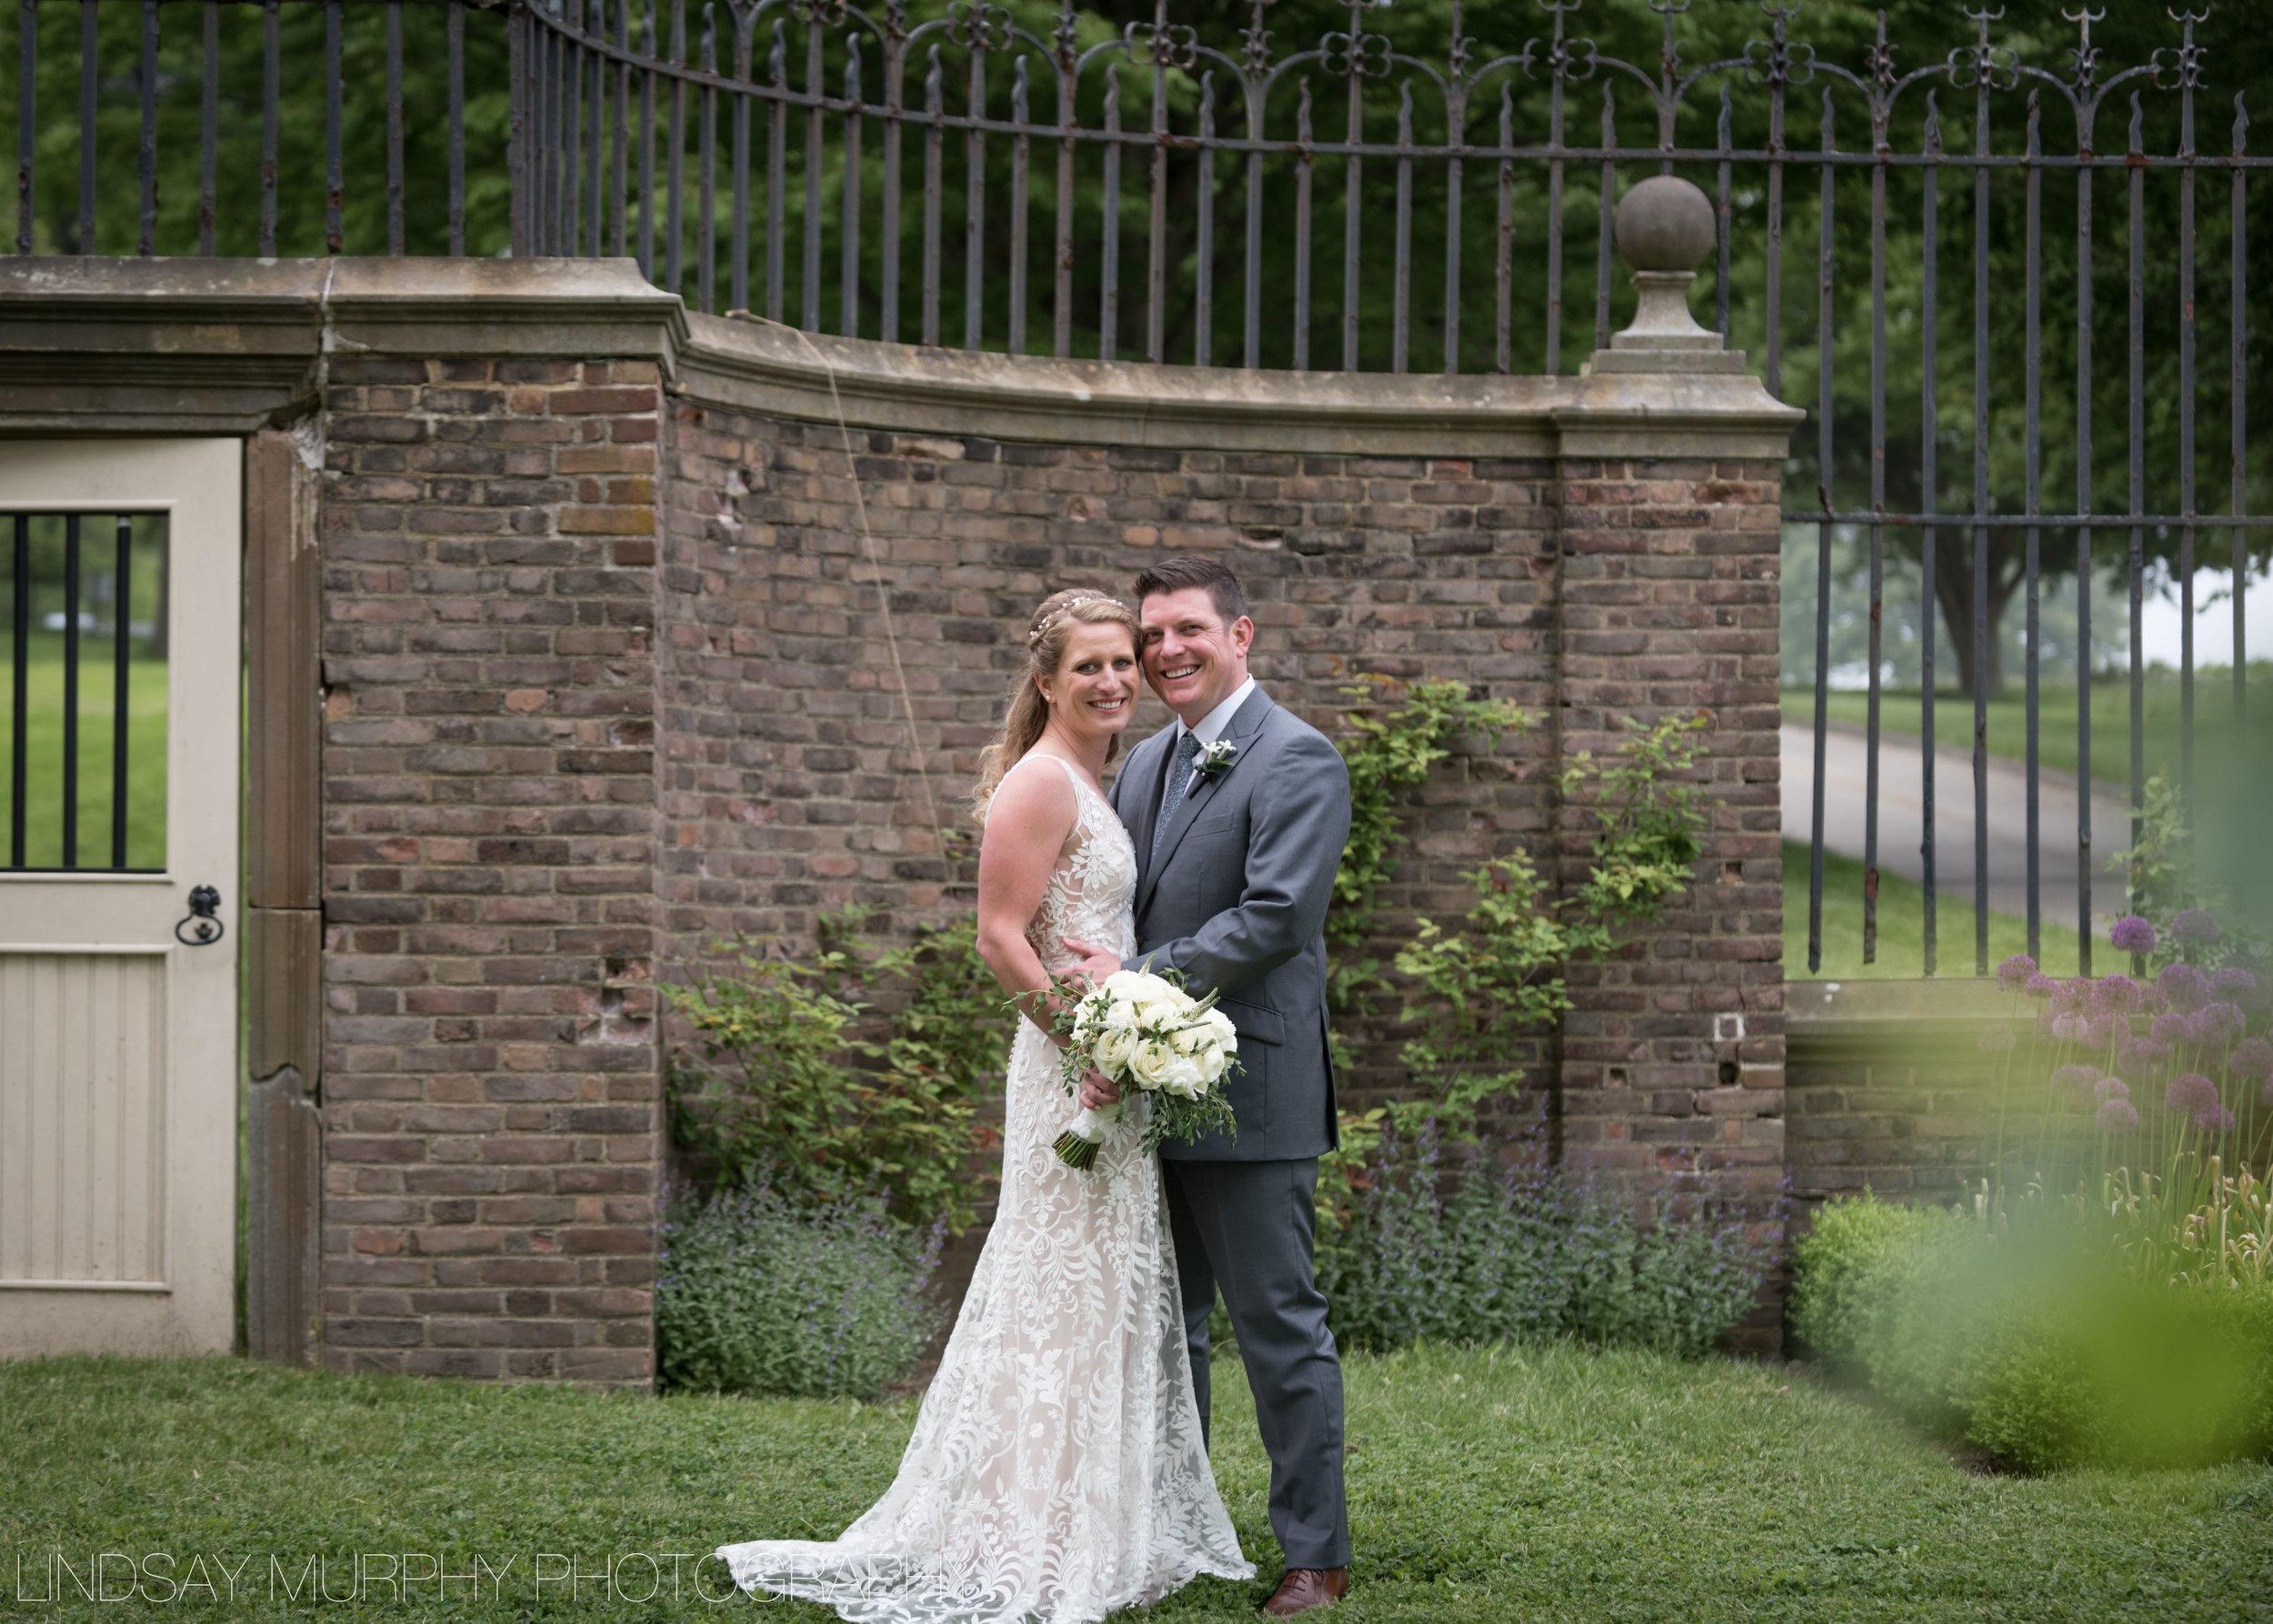 Ipswich_Wedding-59.jpg